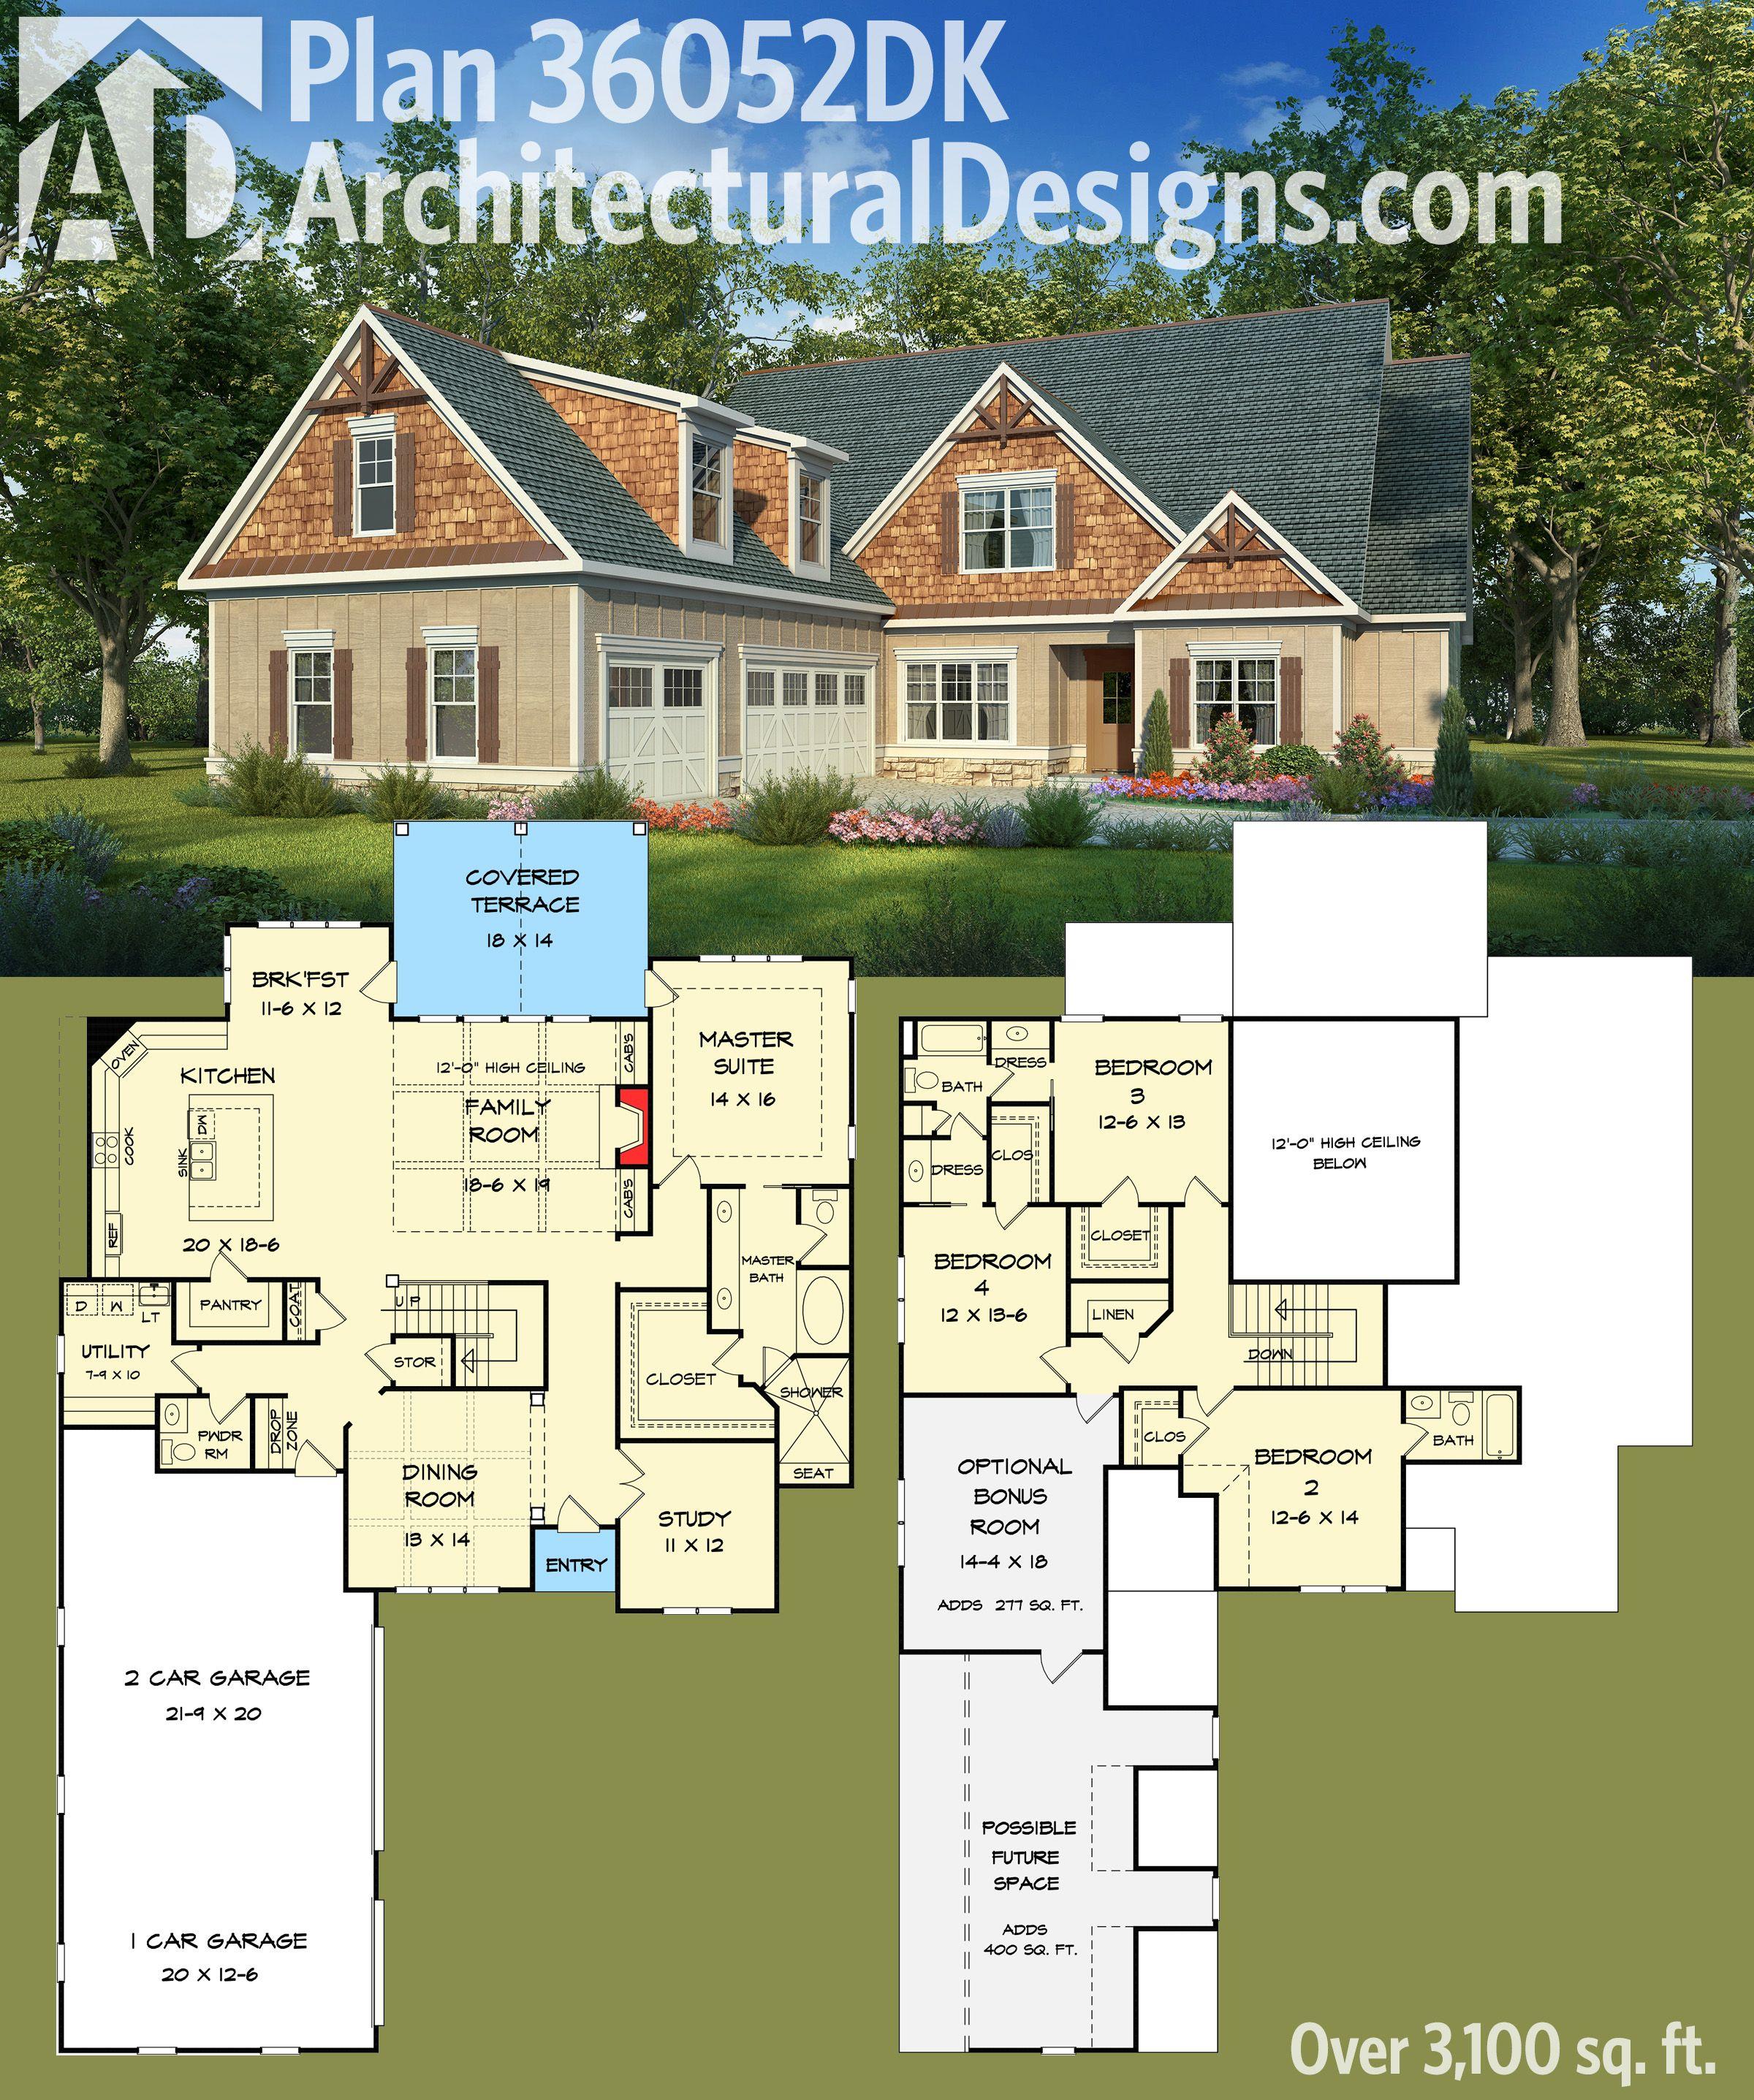 Plan 36052DK: Outstanding Craftsman House Plan In 2018